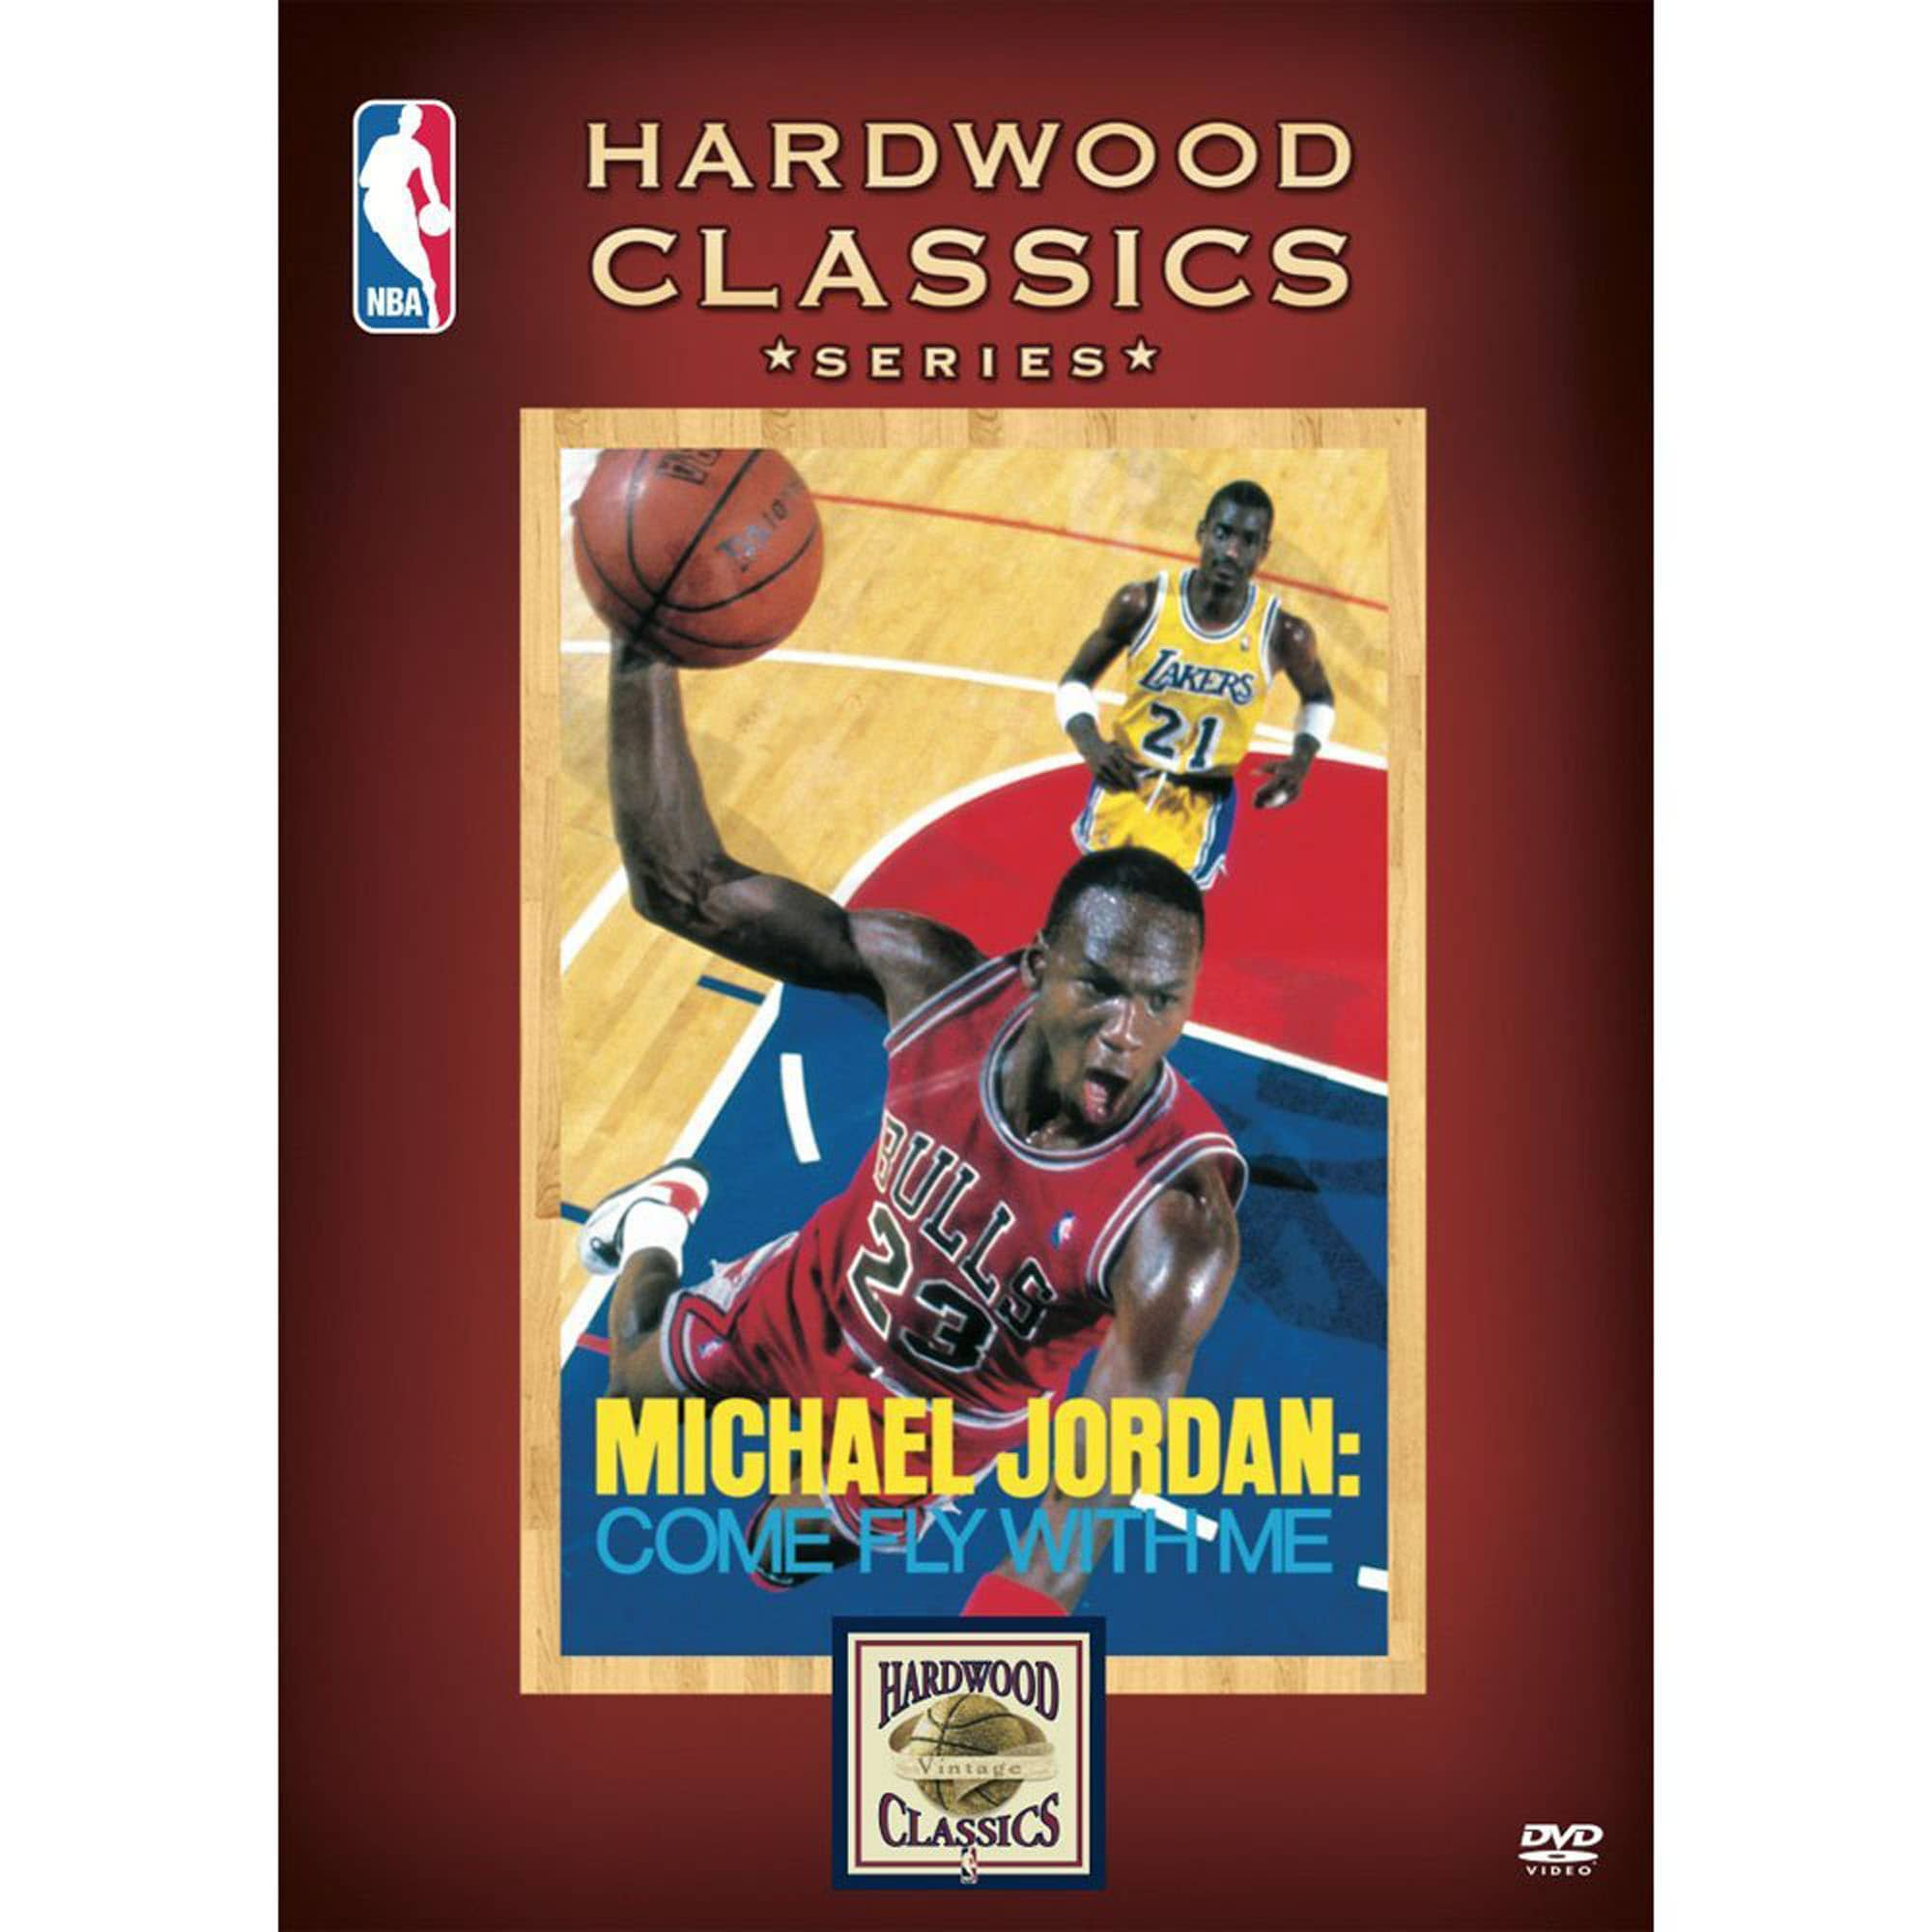 Michael Jordan Chicago Bulls Hardwood Classics: Michael Jordan Come Fly With Me DVD